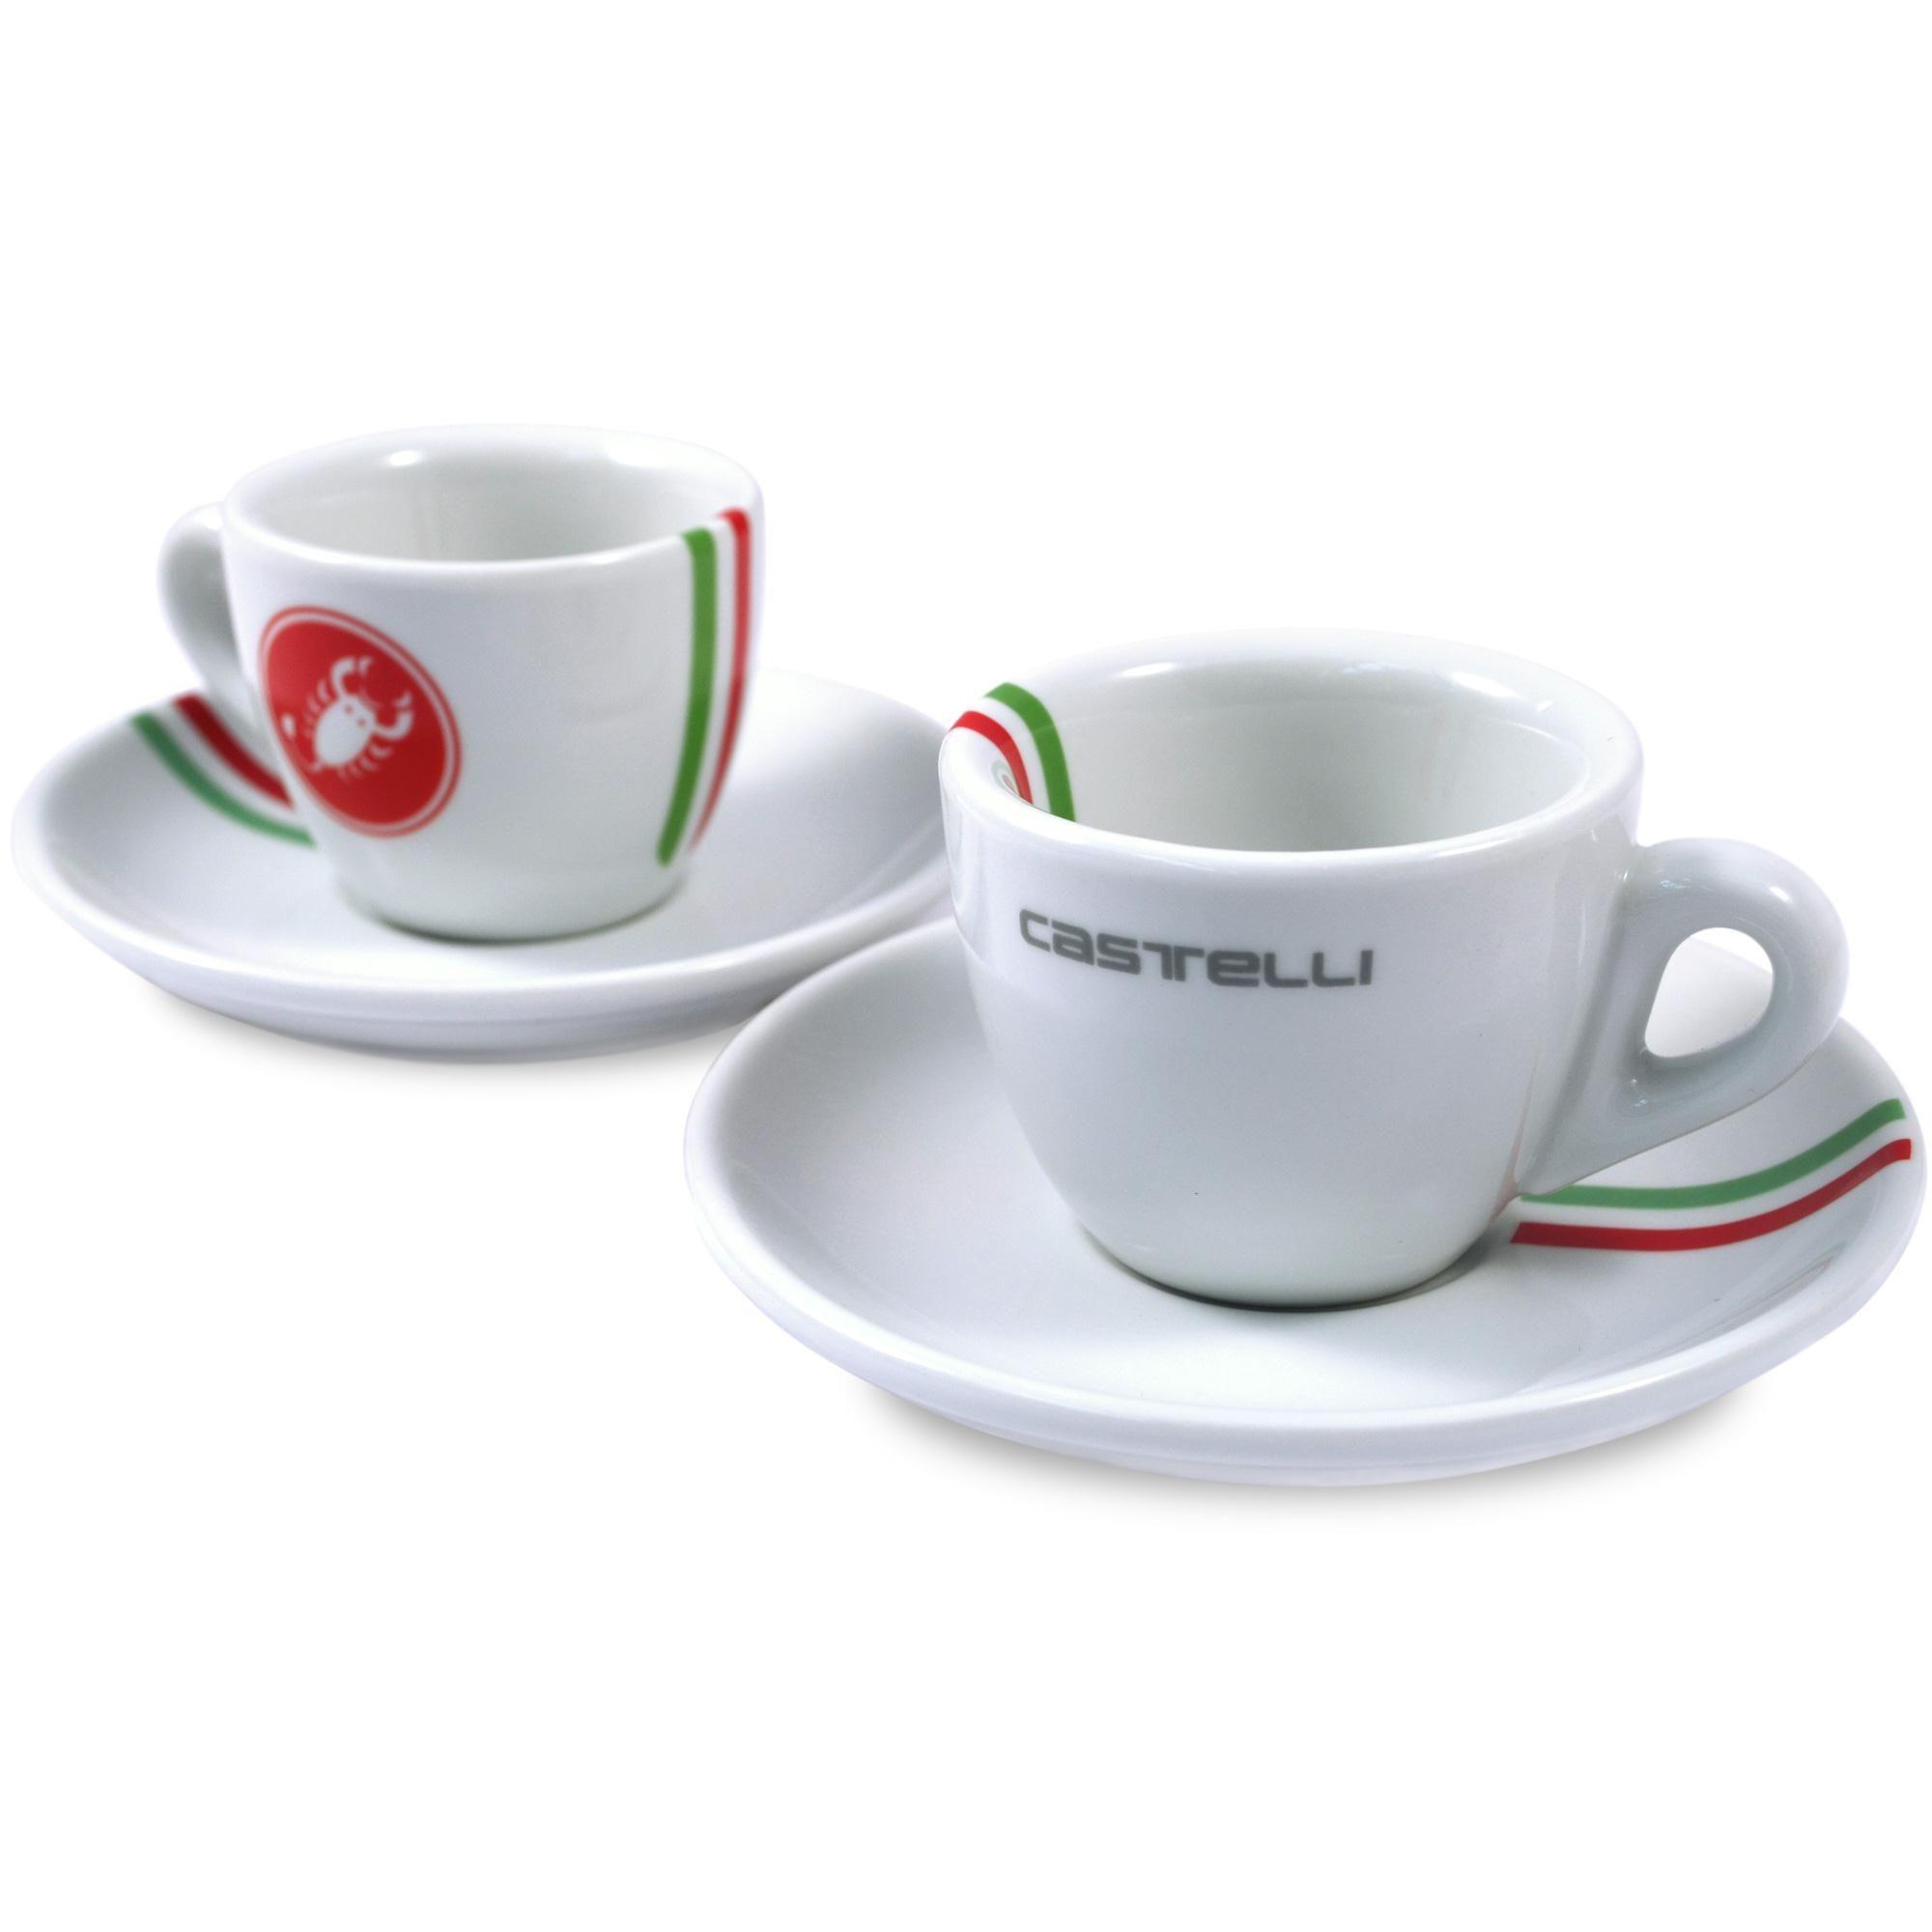 castelli cafe castelli espresso cups  castelli themed gift ideas  - castelli cafe castelli espresso cups  castelli themed gift ideas castelli cafe uk